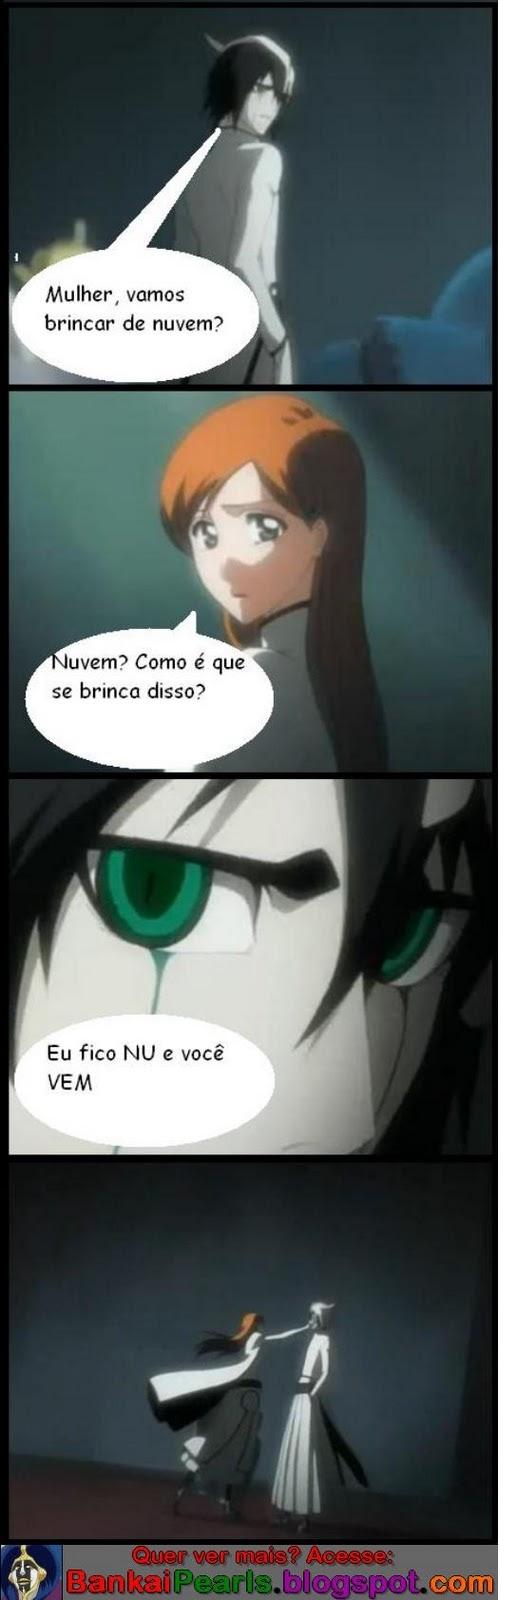 Tirinha Ulquiorra e Orihime [+12] Piadas+Bleach+2